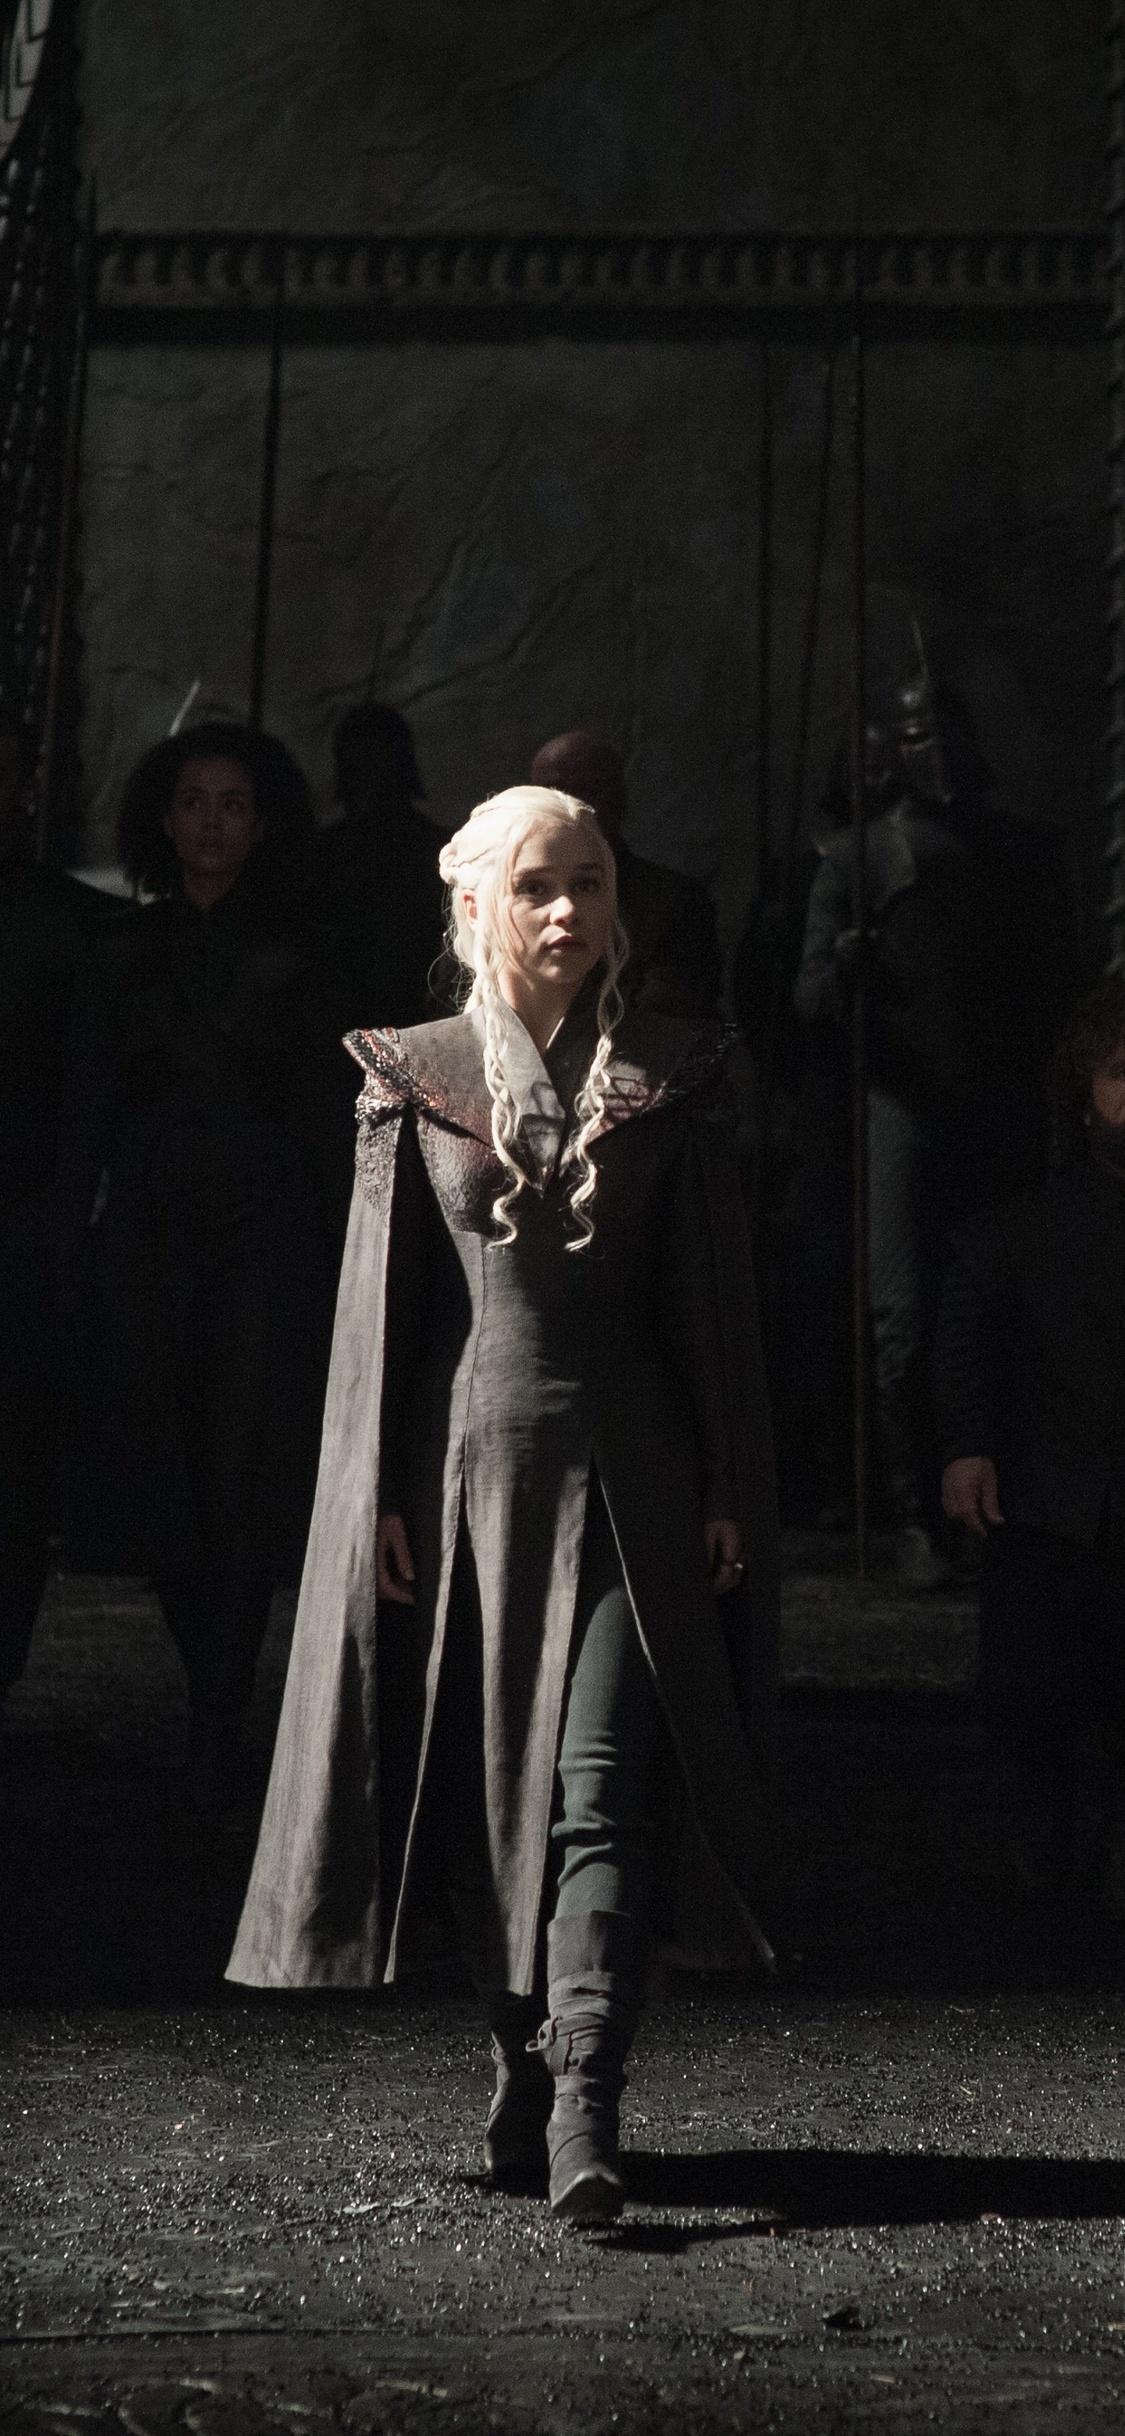 game-of-thrones-season-7-emilia-clarke-as-daenerys-rp.jpg